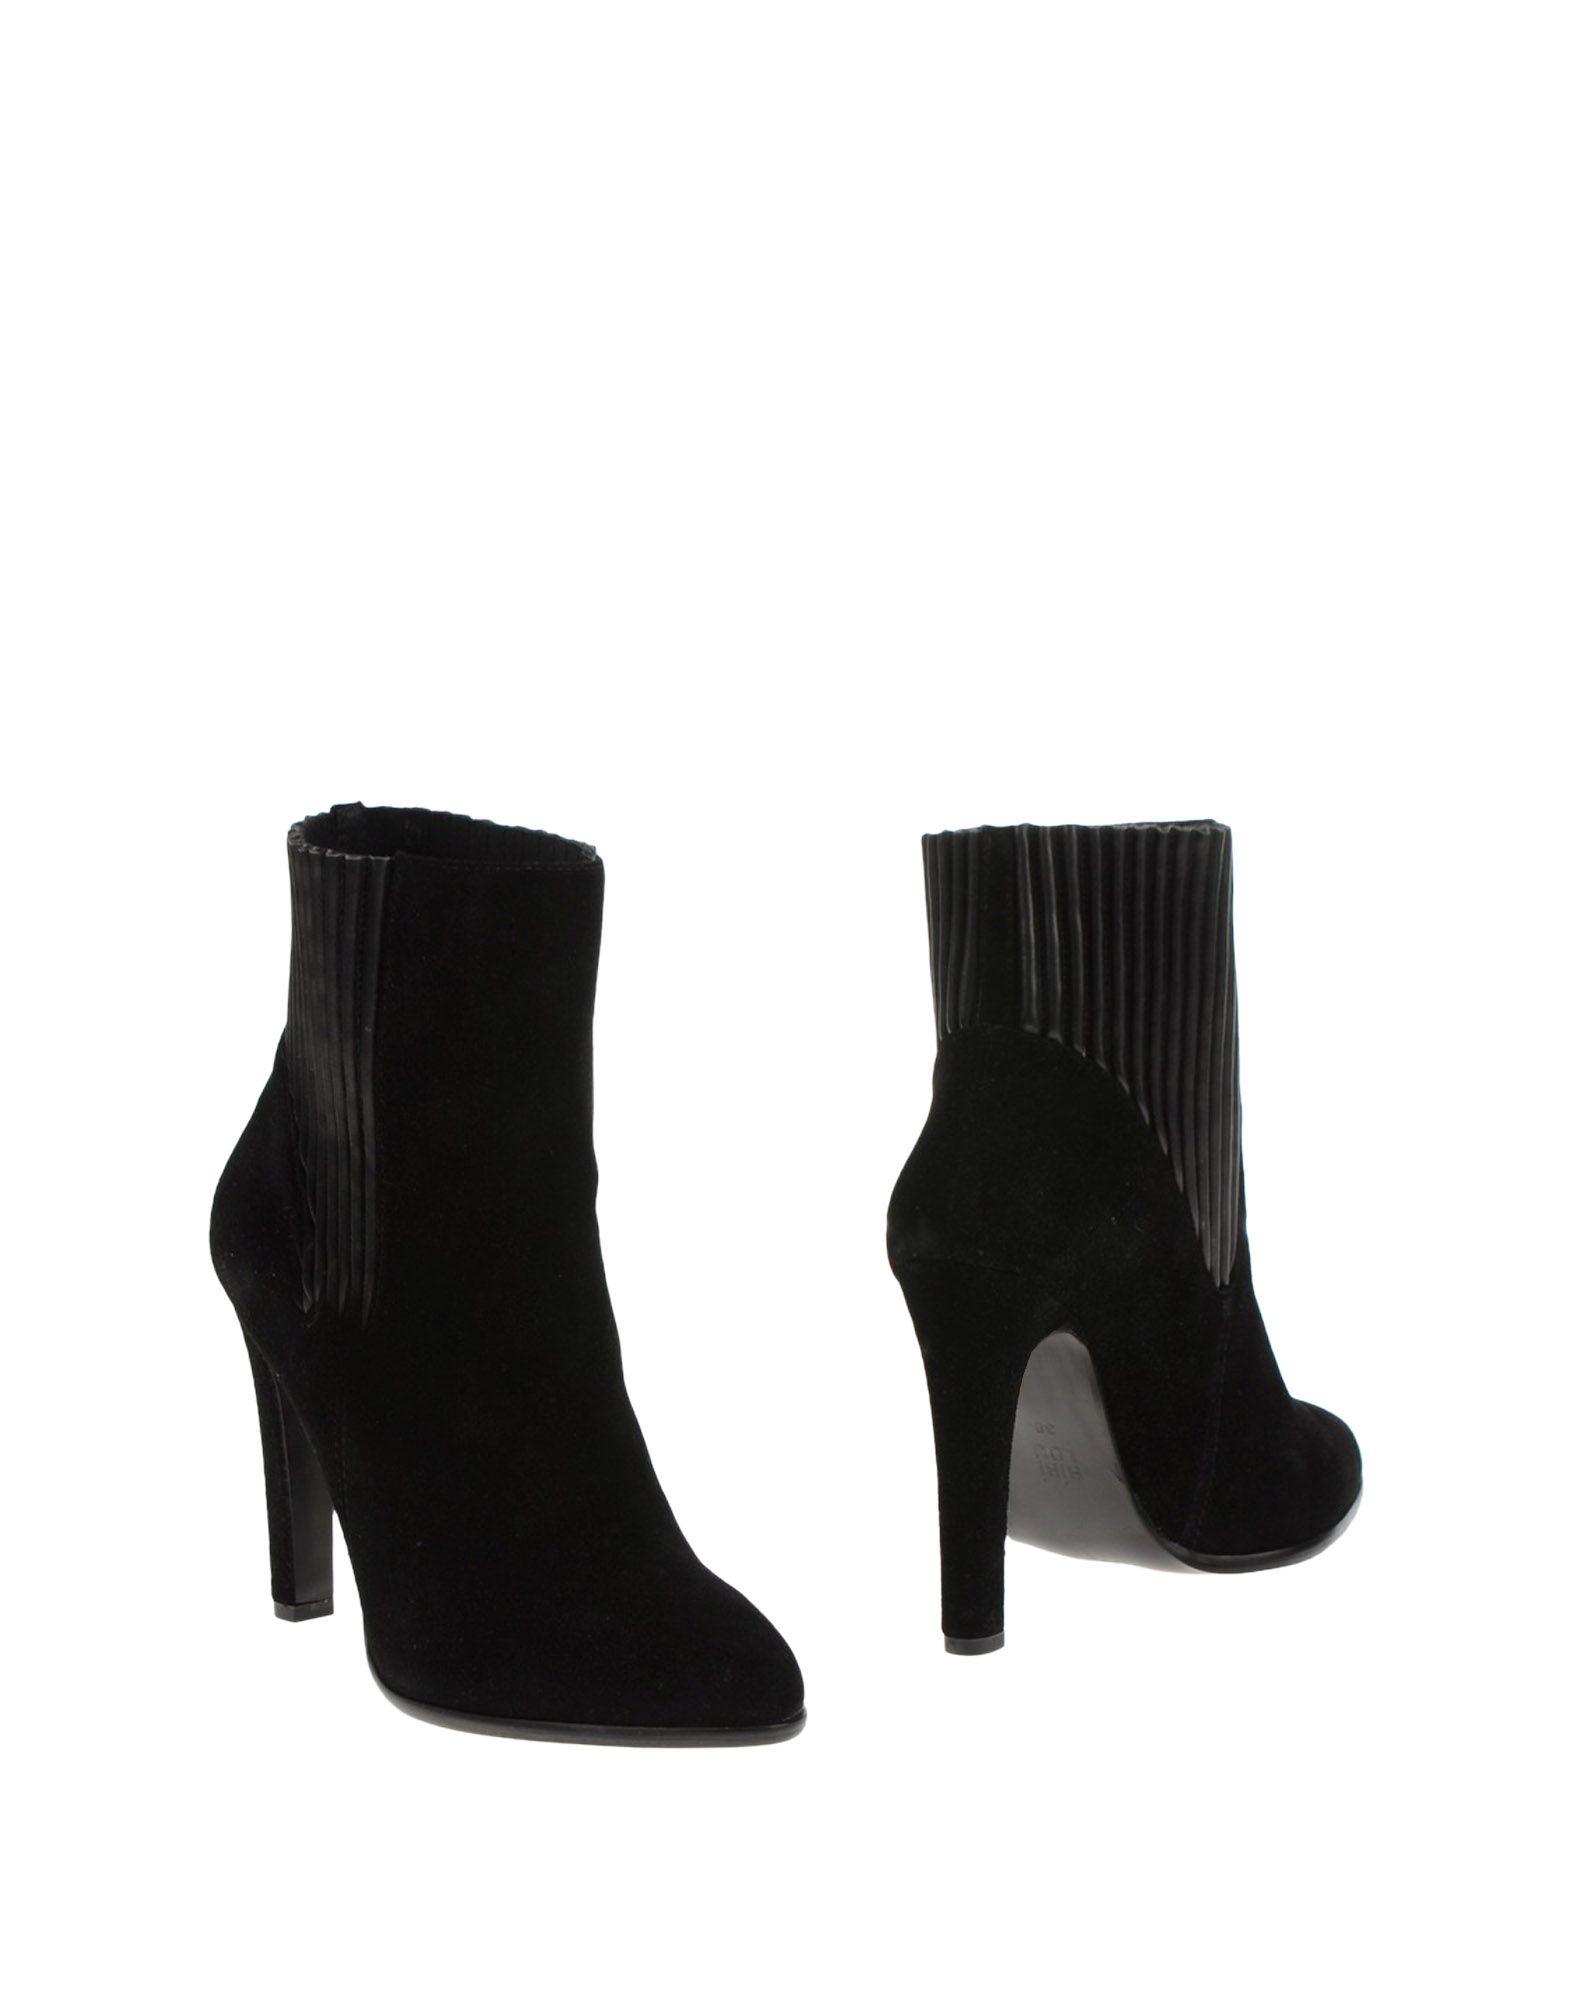 Bibi Lou Stiefelette Damen  11246412PN Gute Qualität beliebte Schuhe